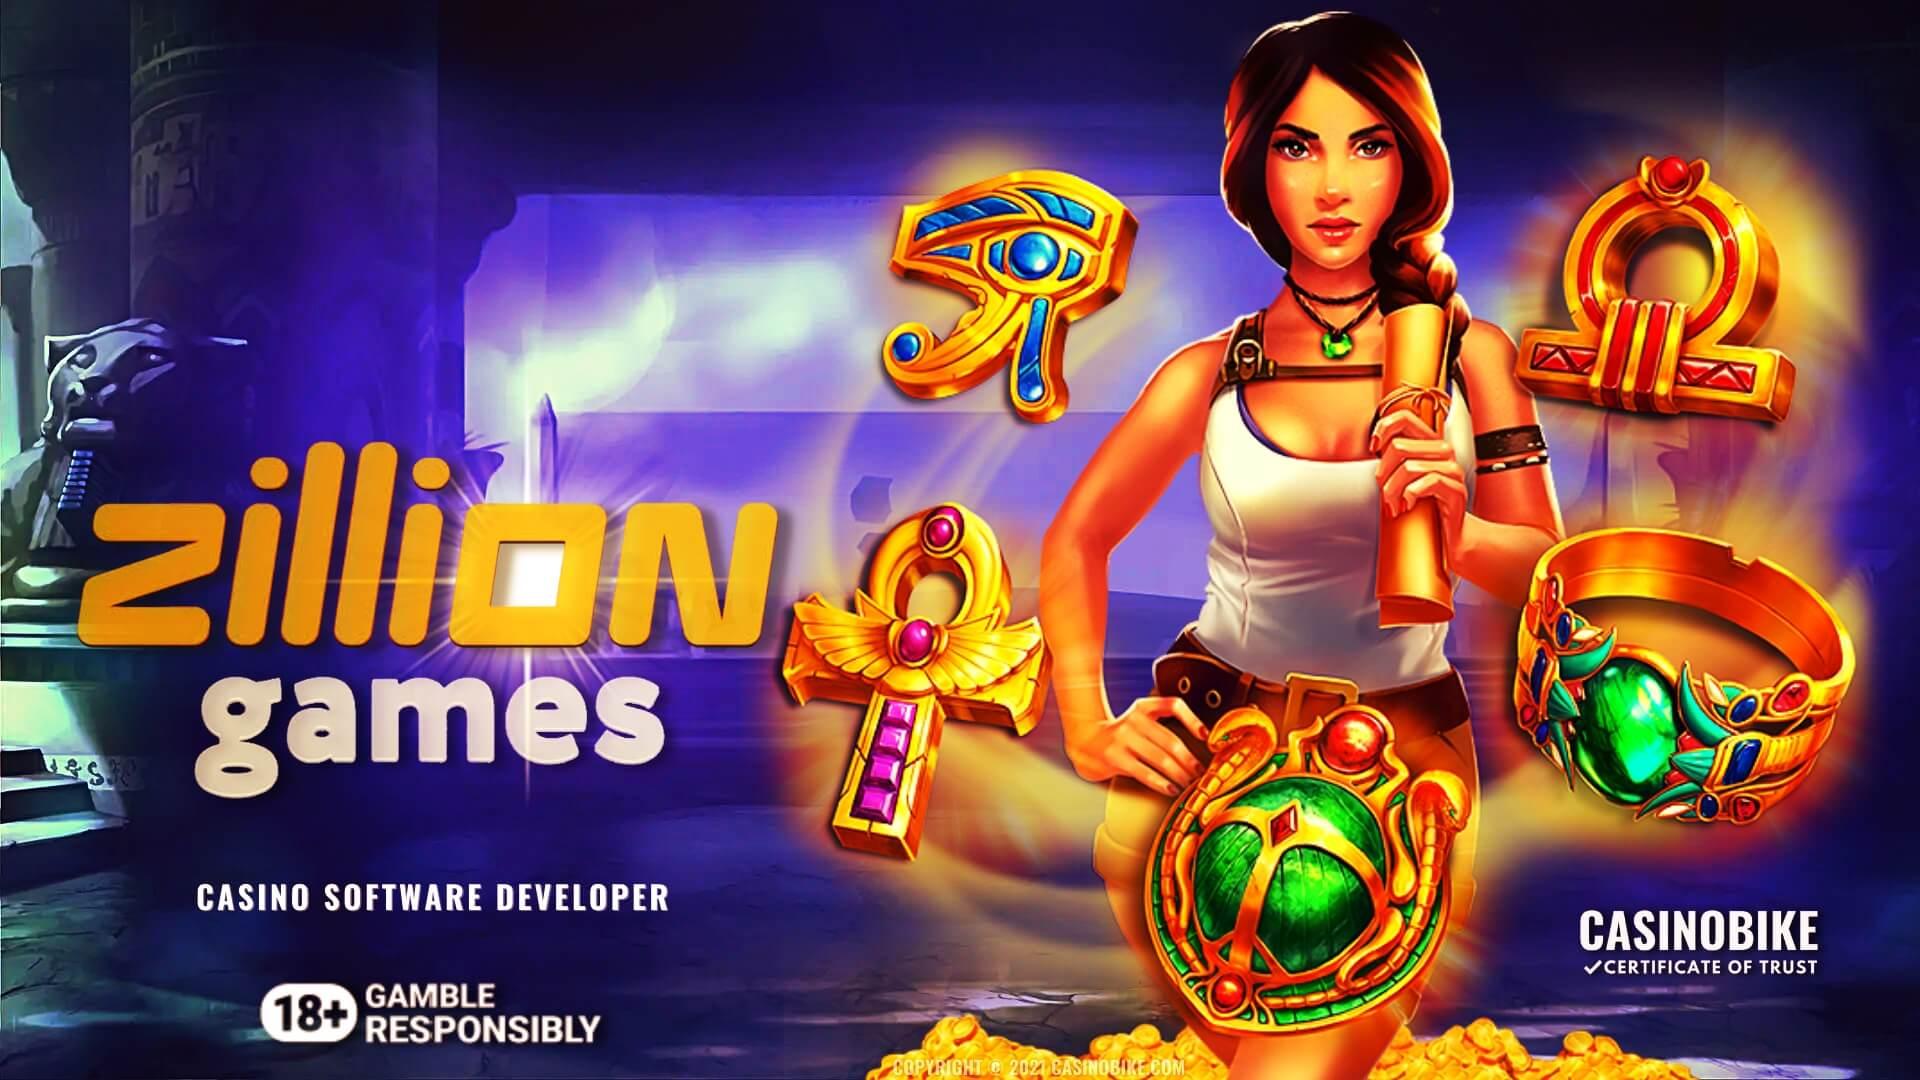 Zillion Games Online Casino Software Developer